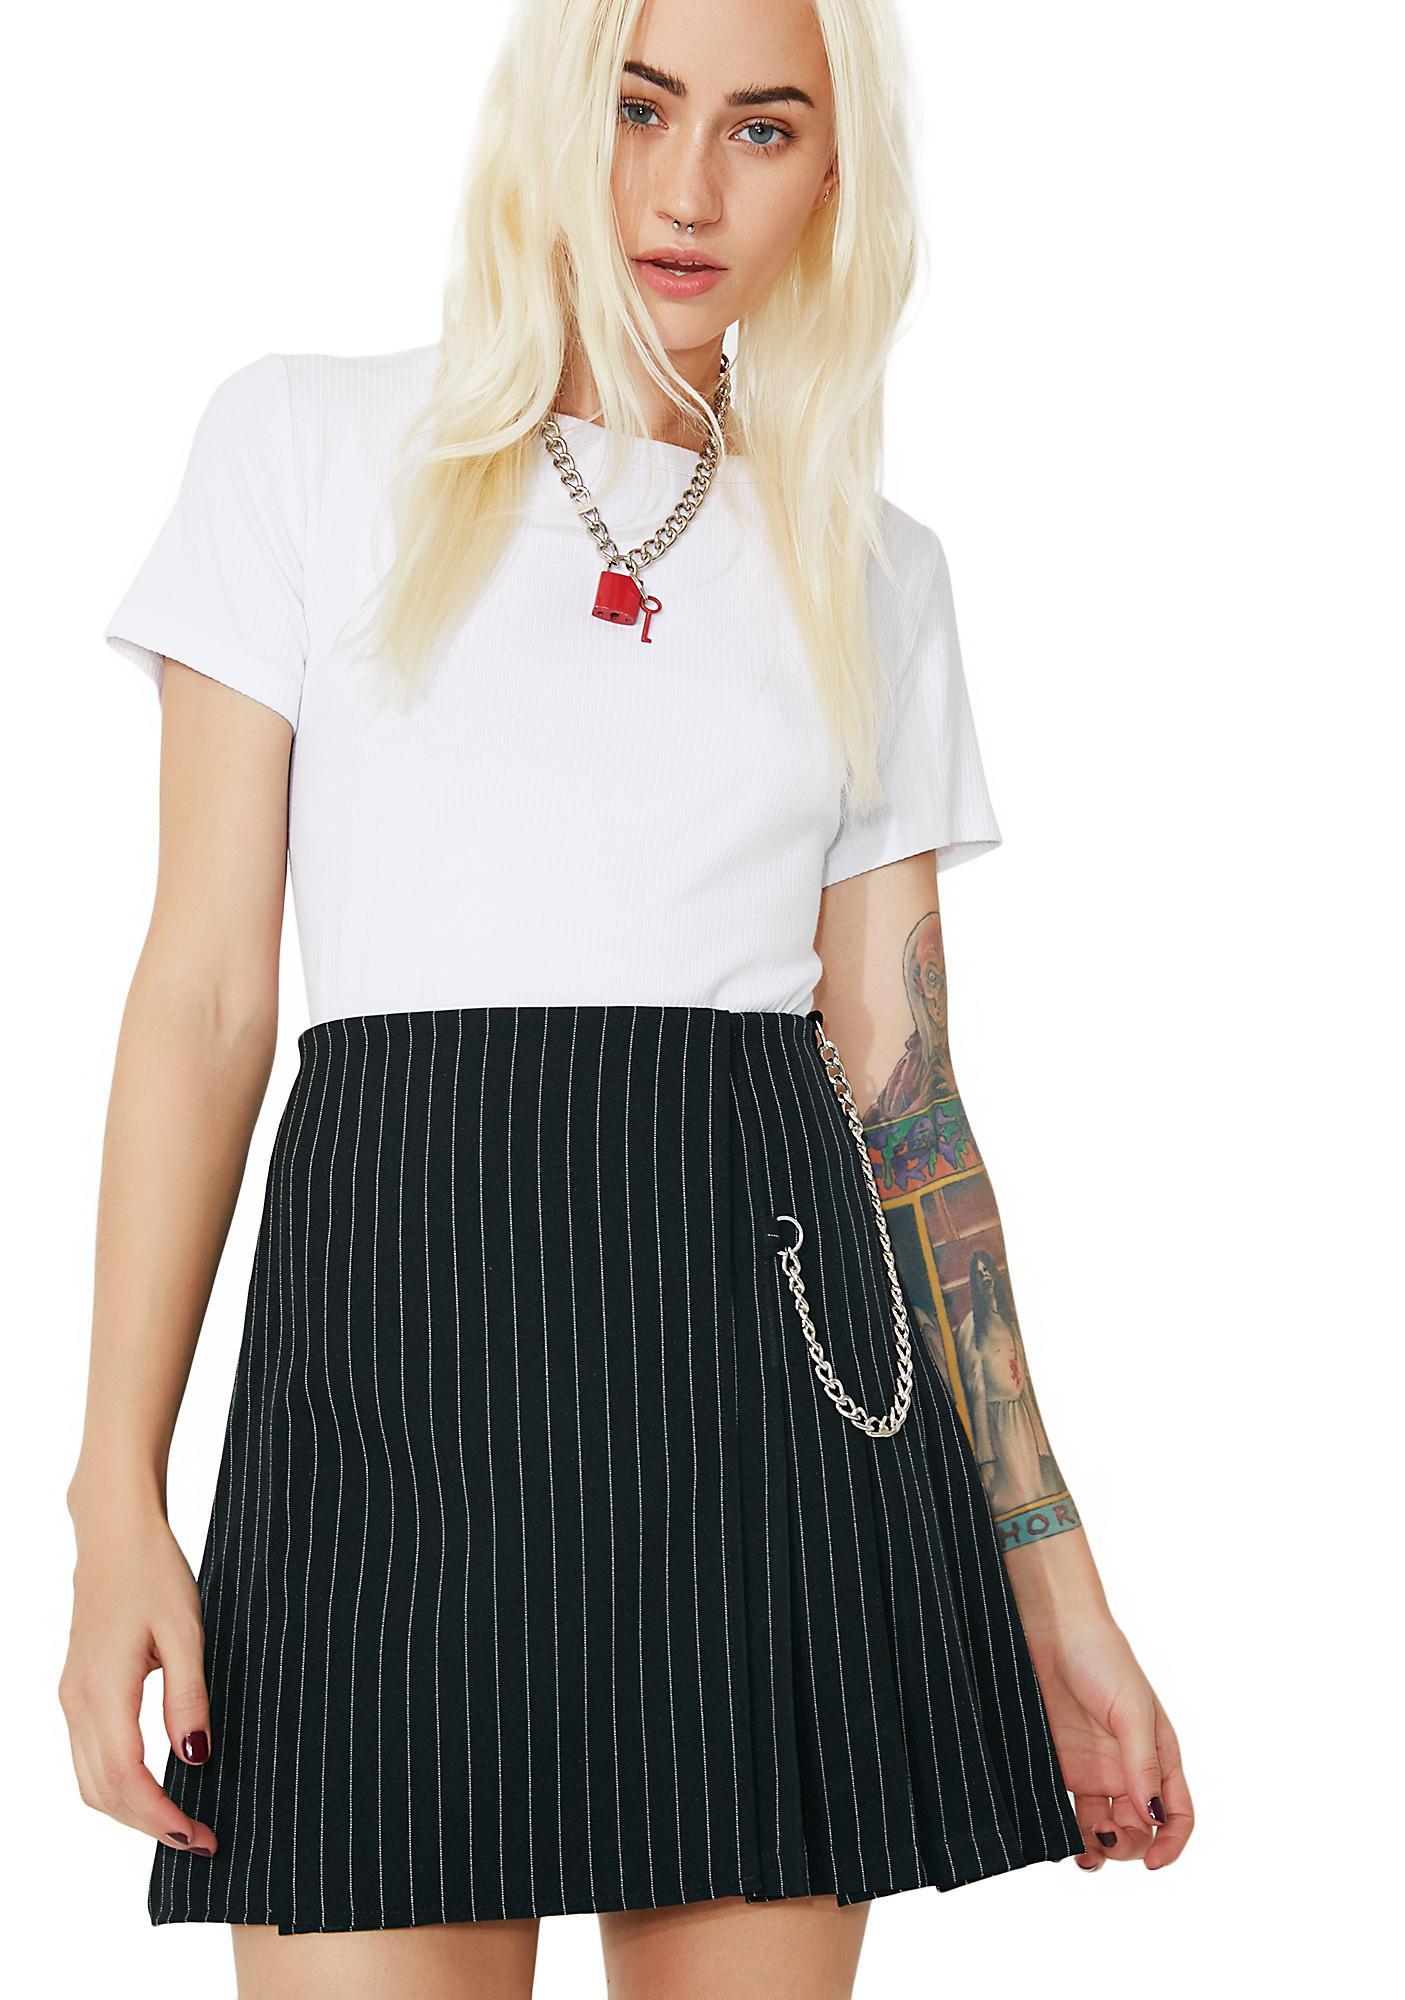 The Ragged Priest Grudge Skirt